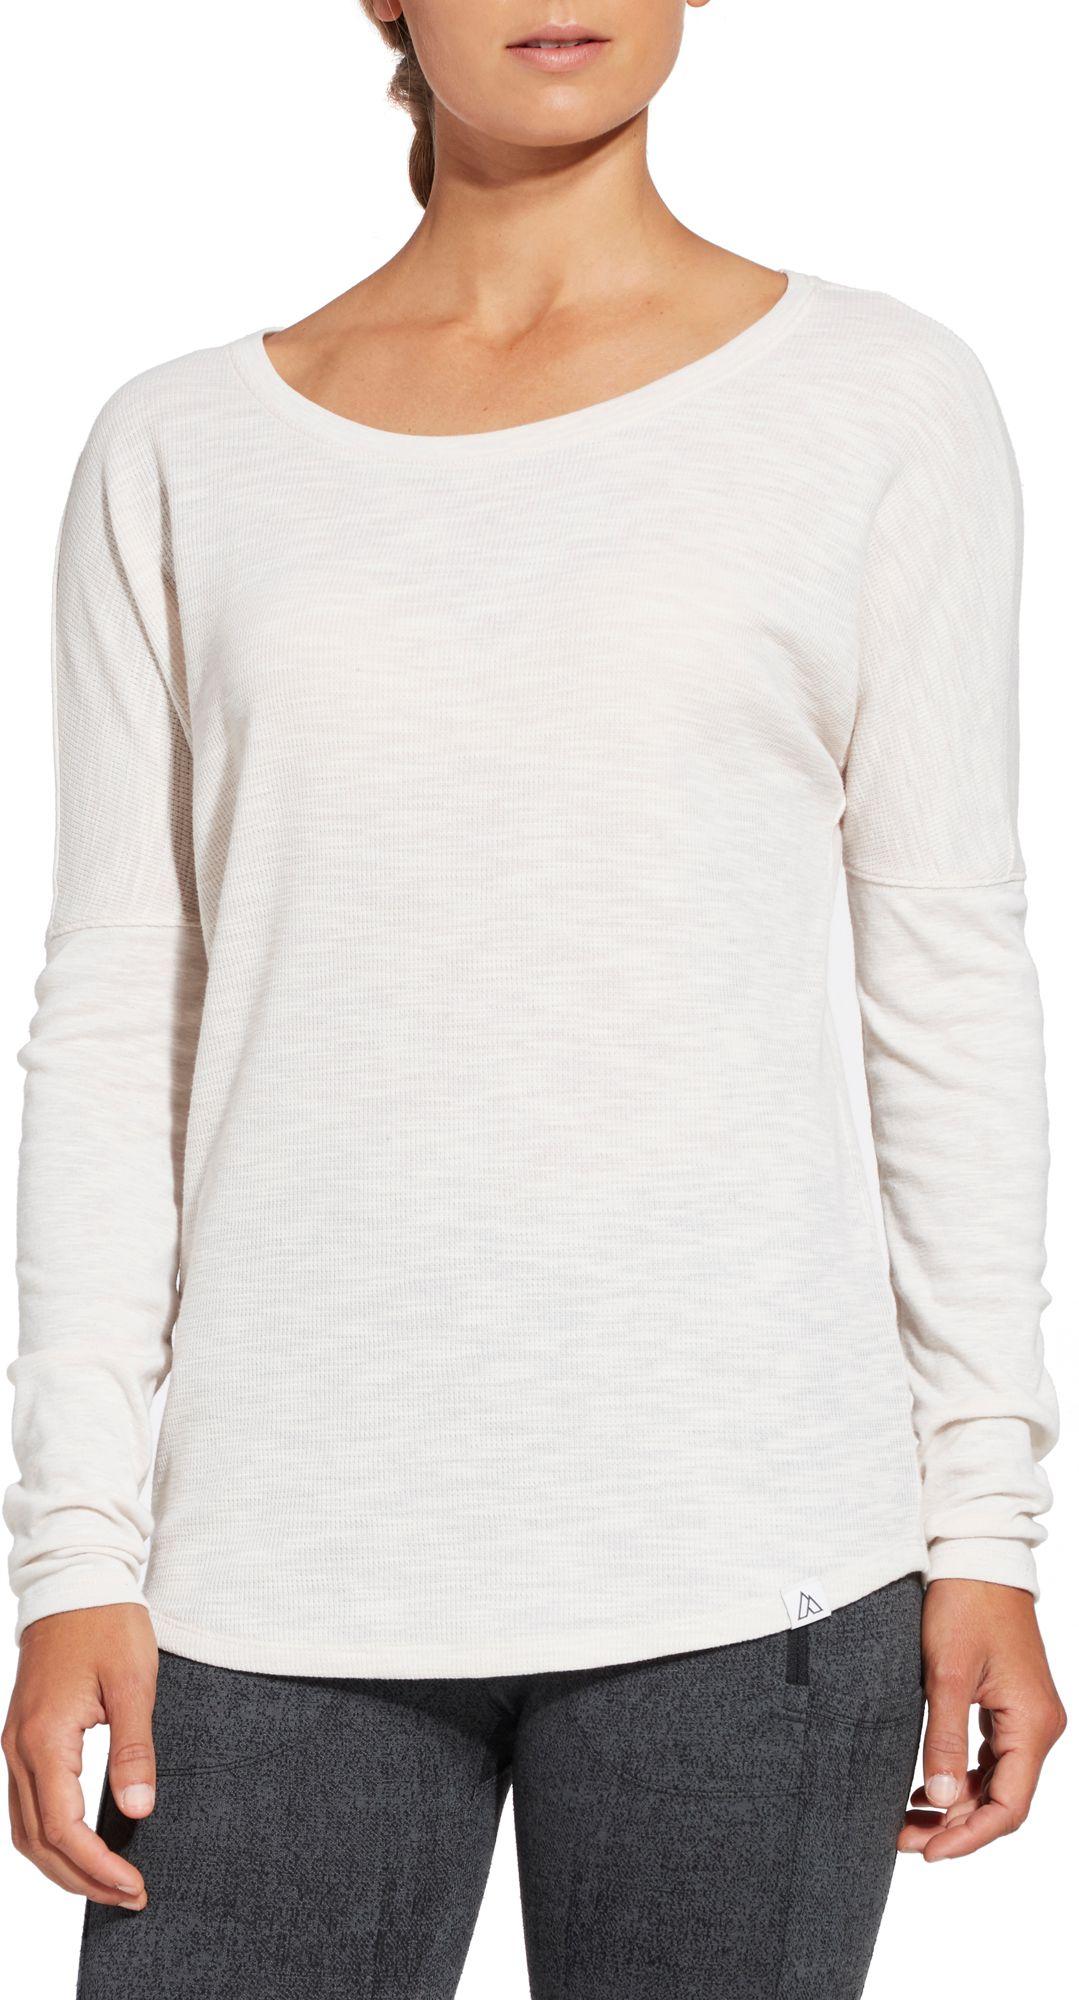 Alpine Design Women's Thermal Long Sleeve Shirt, Size: XS, Pastel Parchment Heather thumbnail